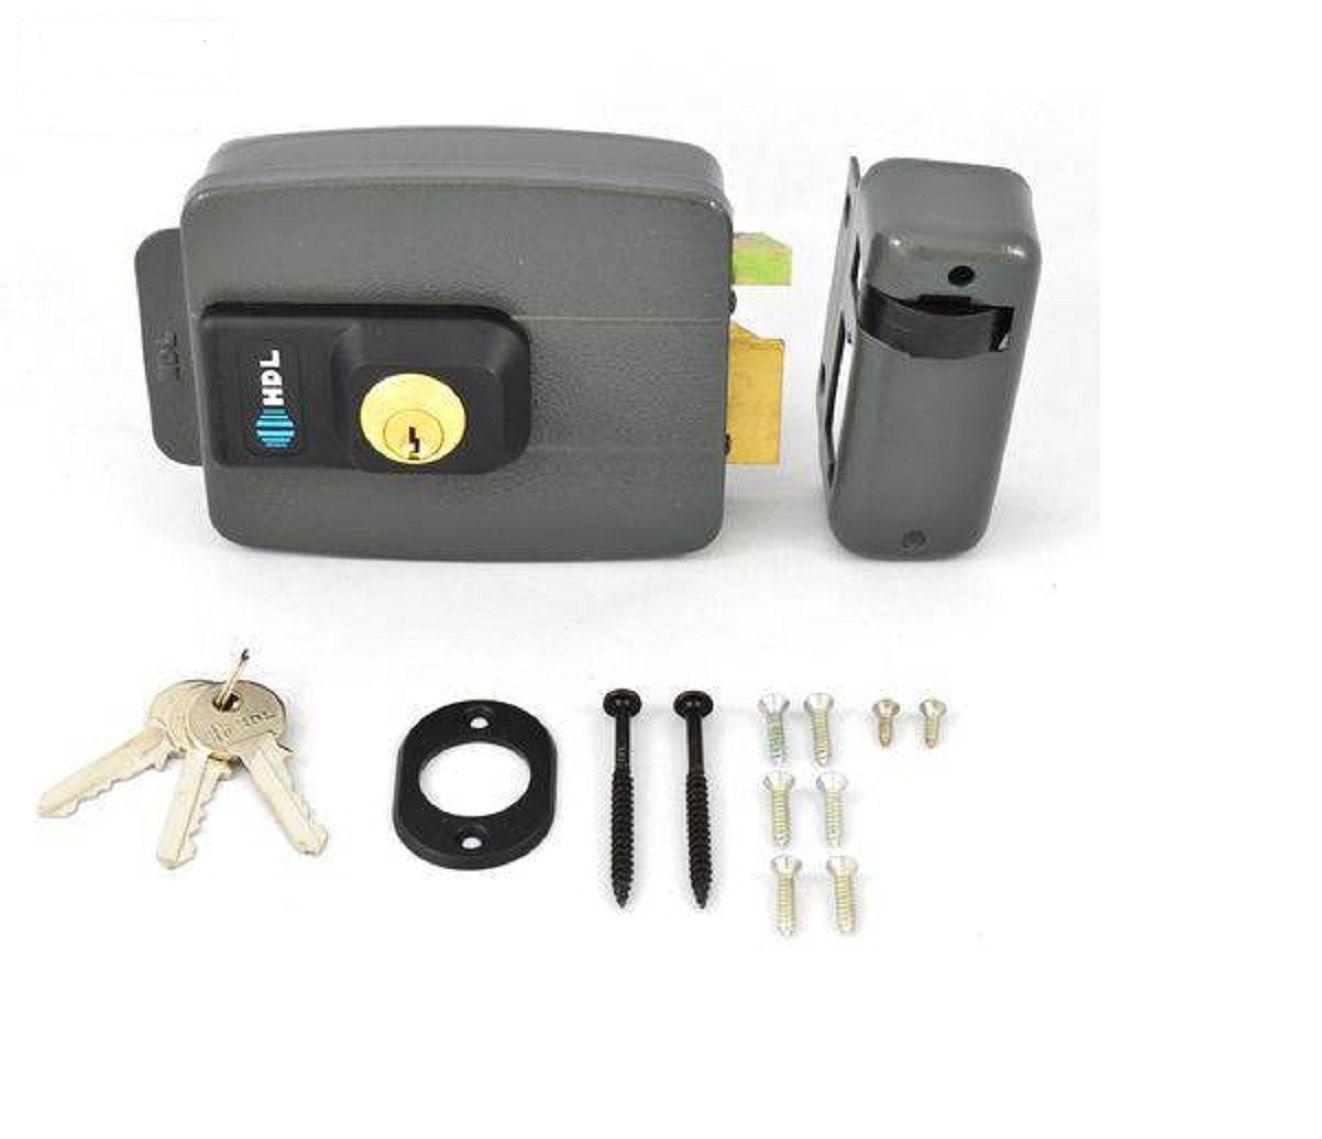 Fechadura HDL Elétrica C90 Dupla - Cinza